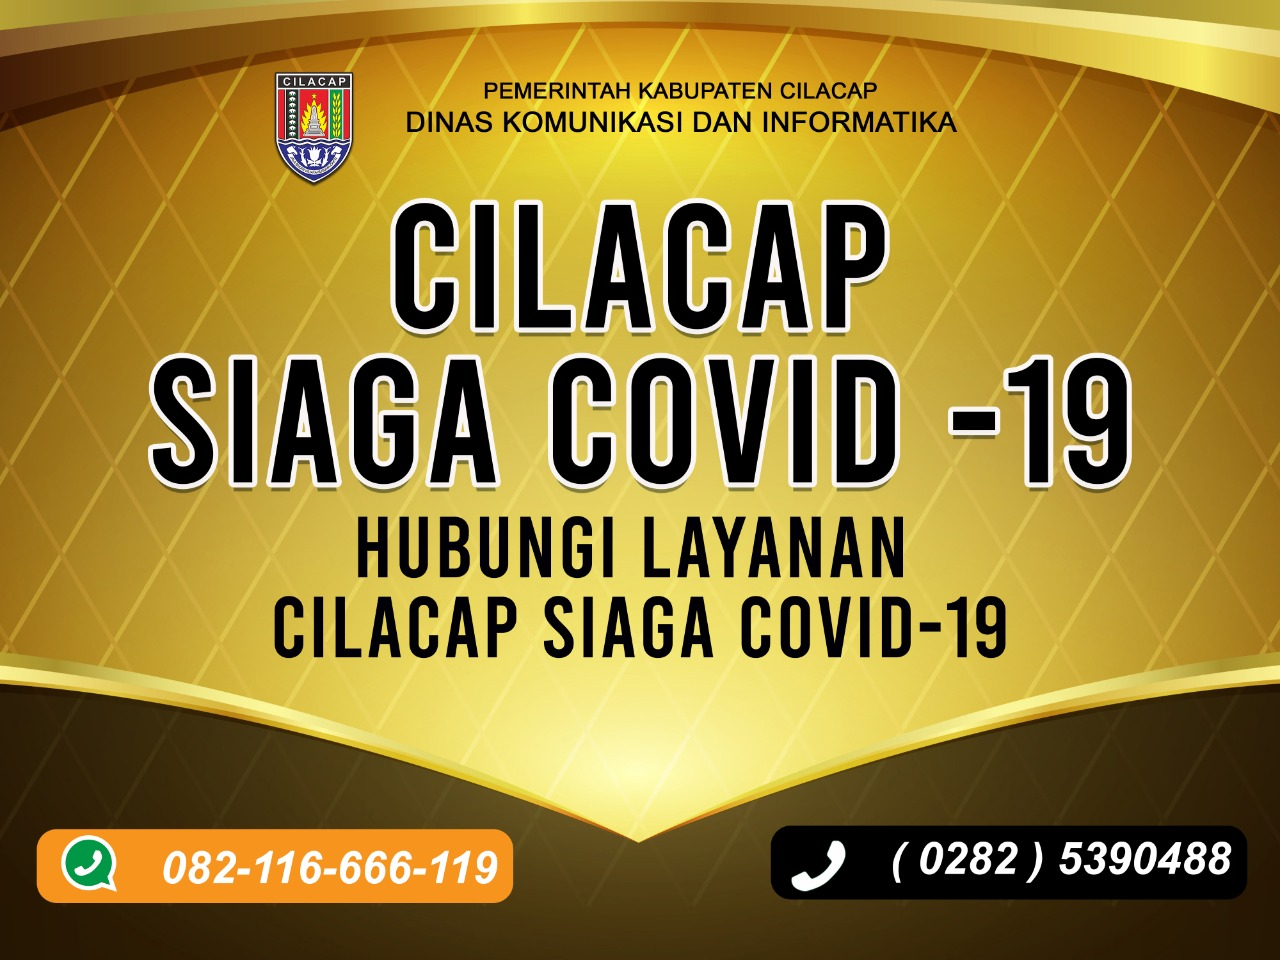 DISKOMINFO CILACAP SIAGA COVID-19